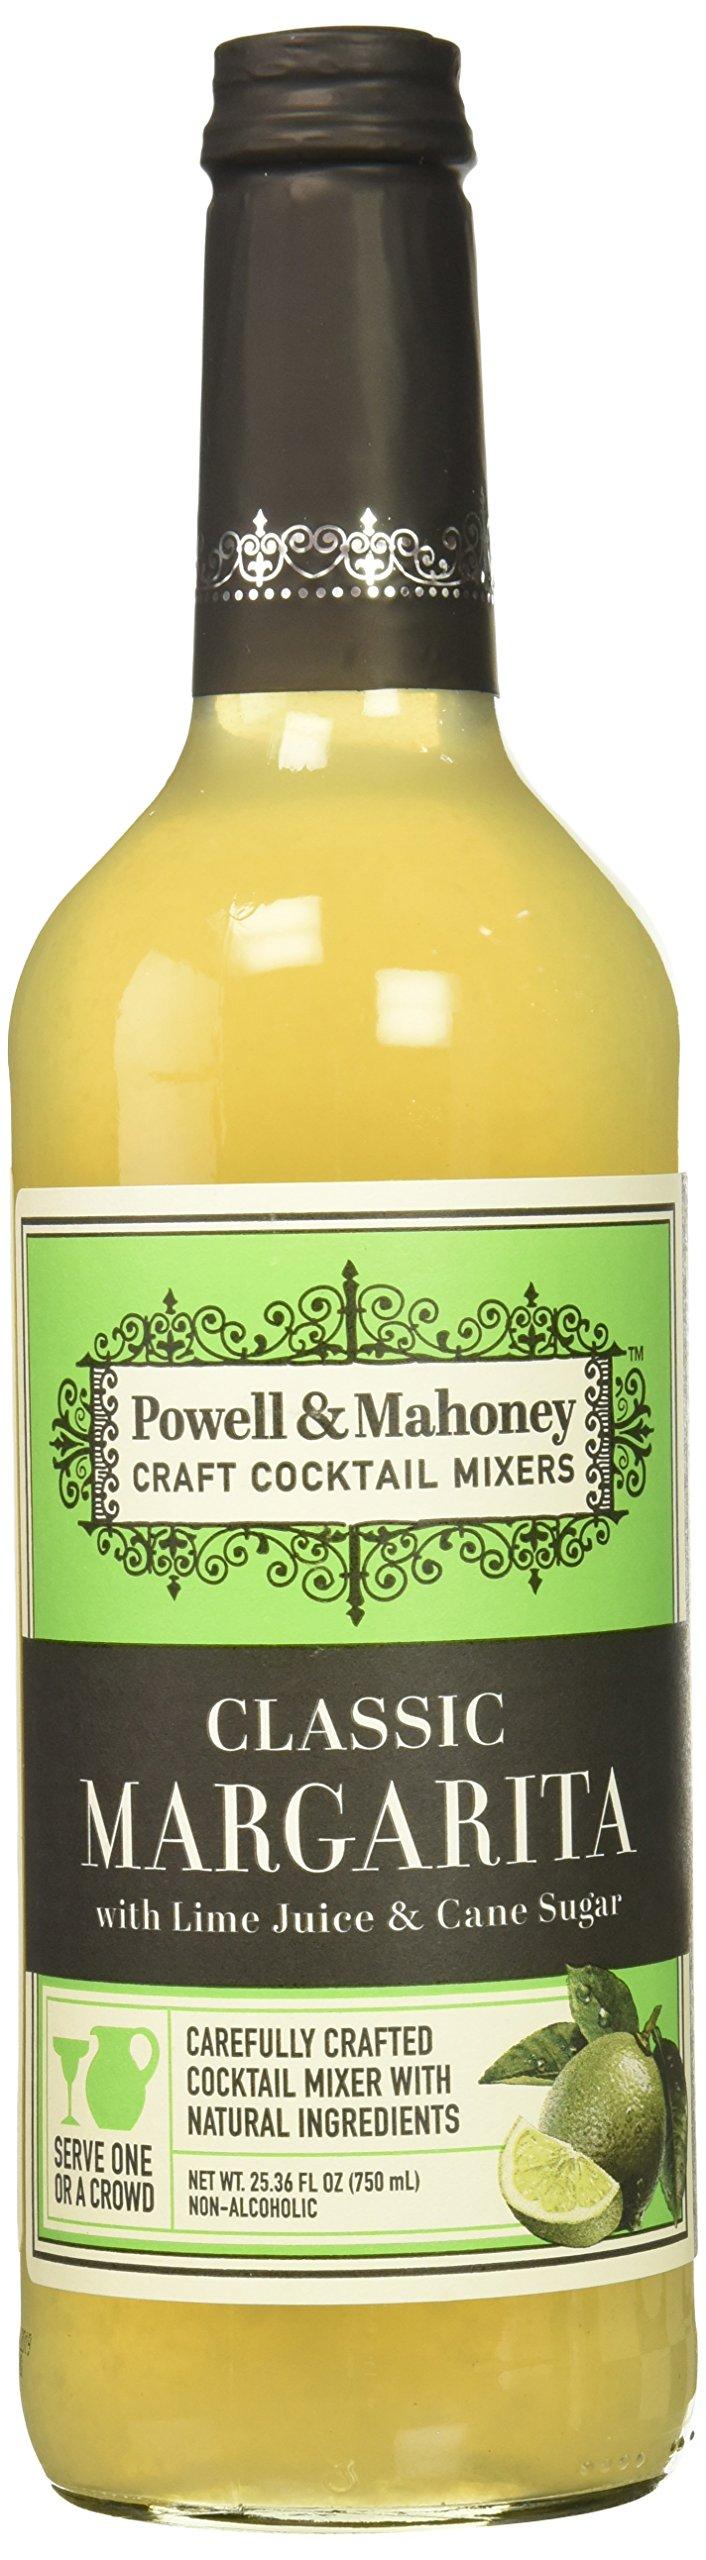 Powell & Mahoney Margarita Vintage Original Cocktail Mixer - 750 ml